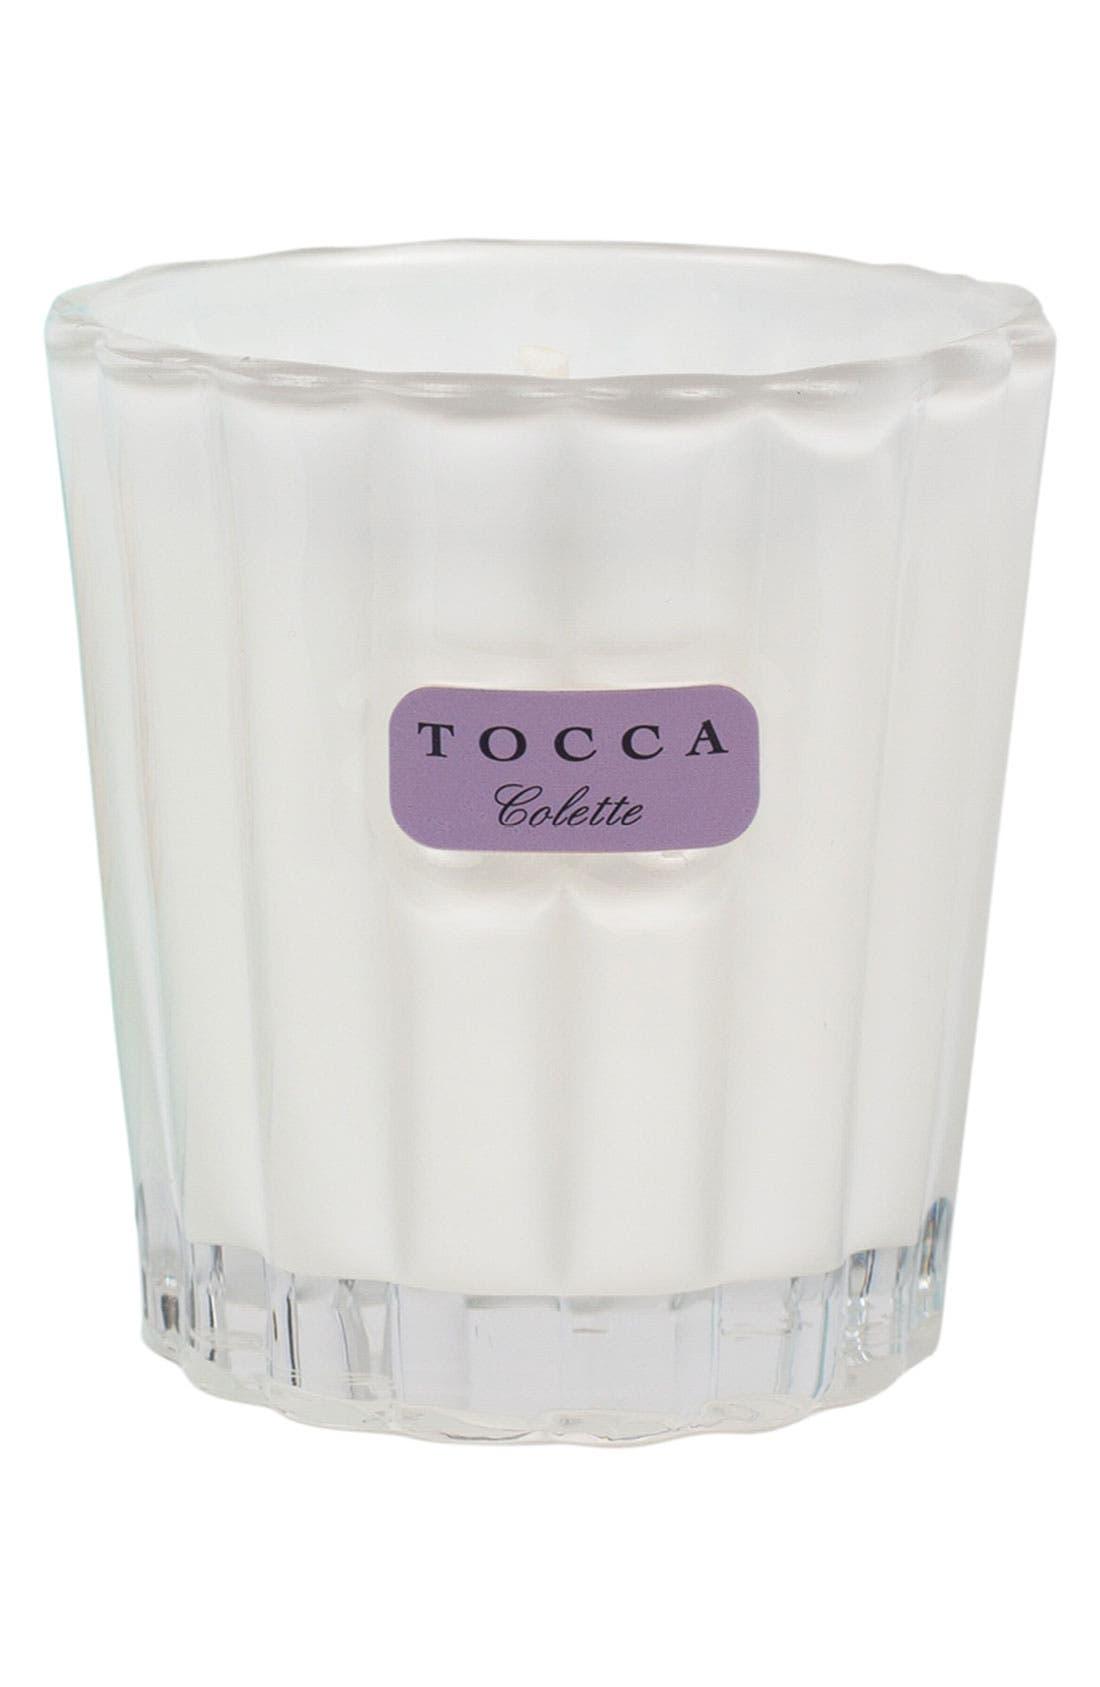 TOCCA 'Colette' Candelina